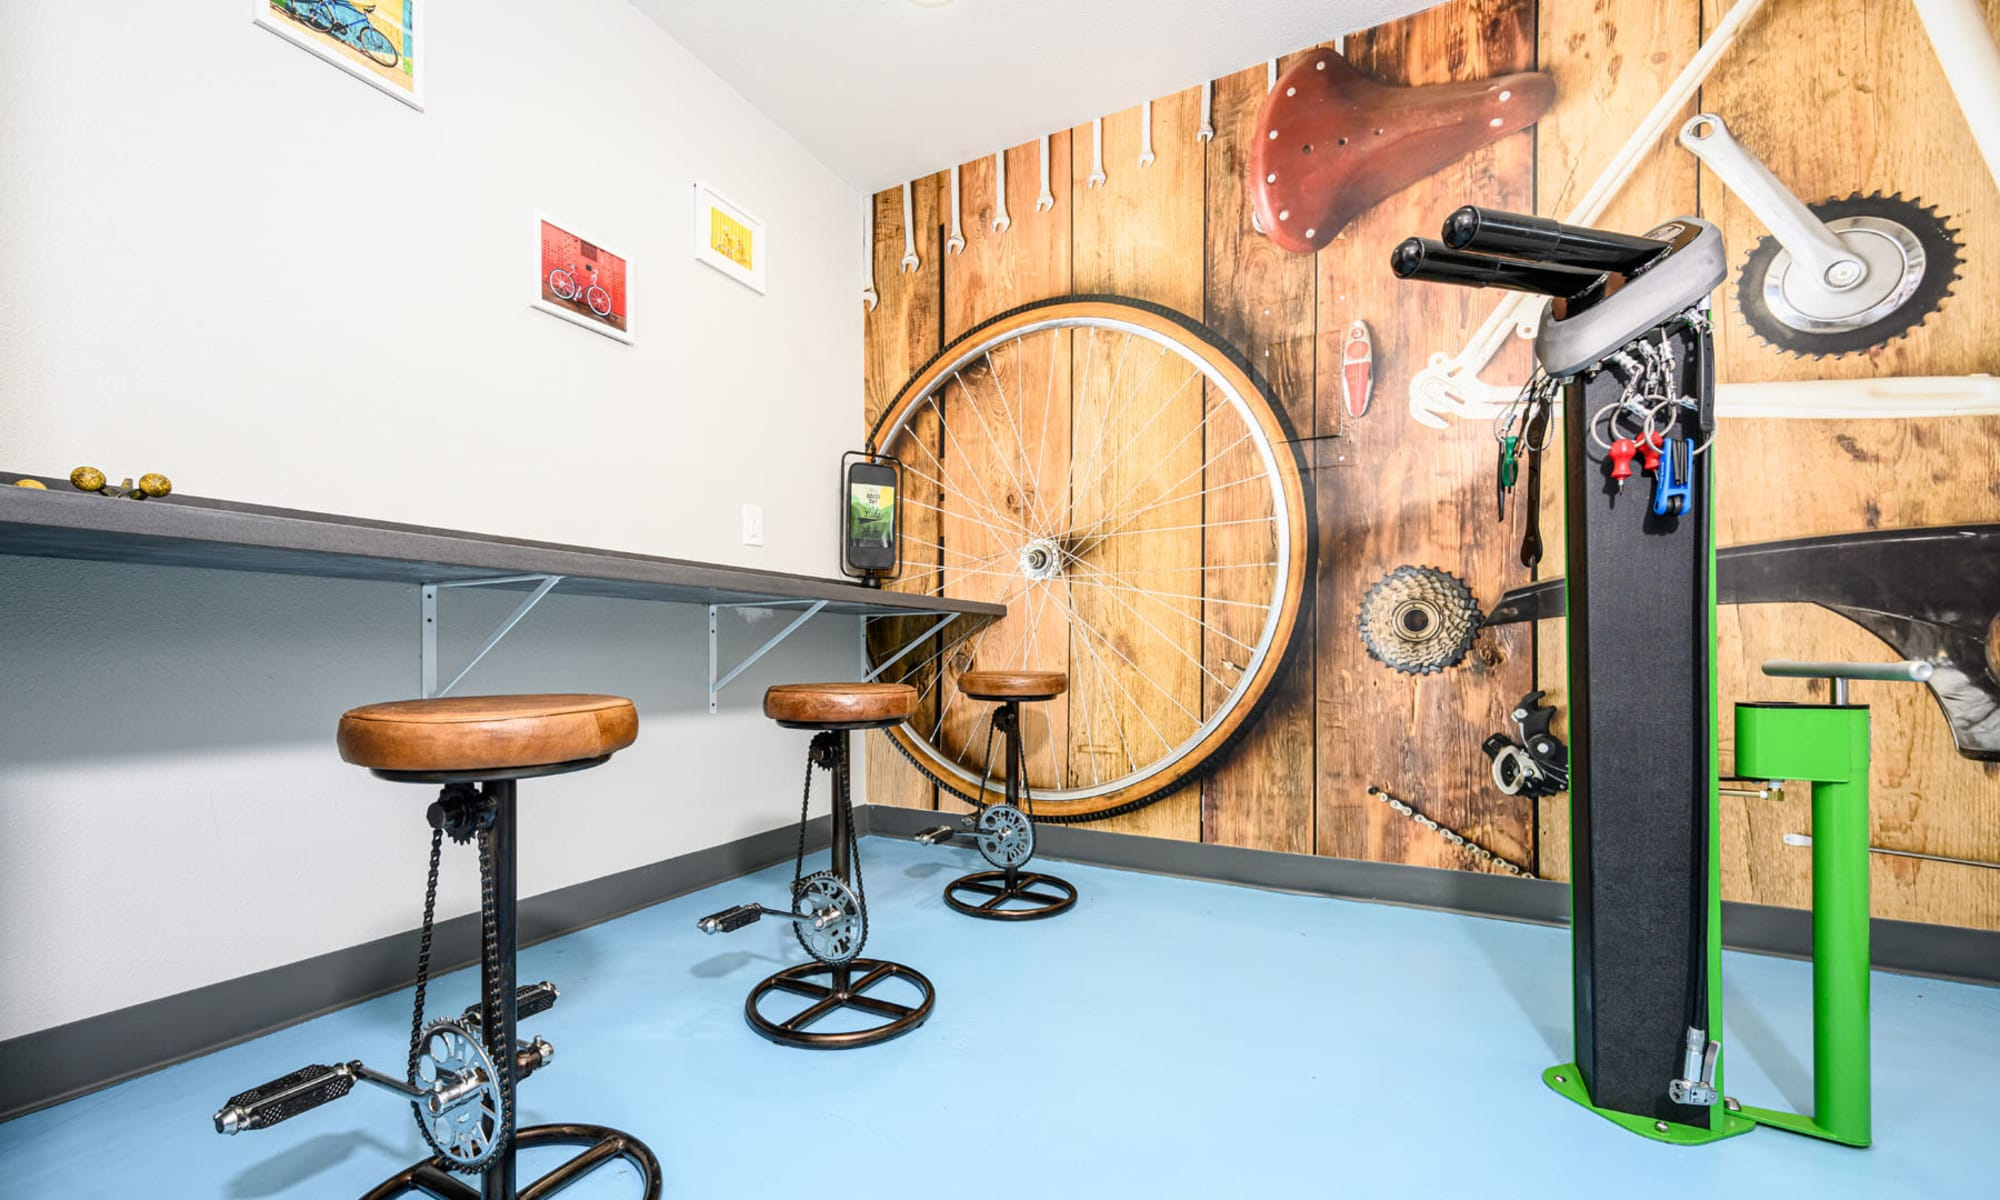 Bicycle repair center at Sendero Huntington Beach in Huntington Beach, California